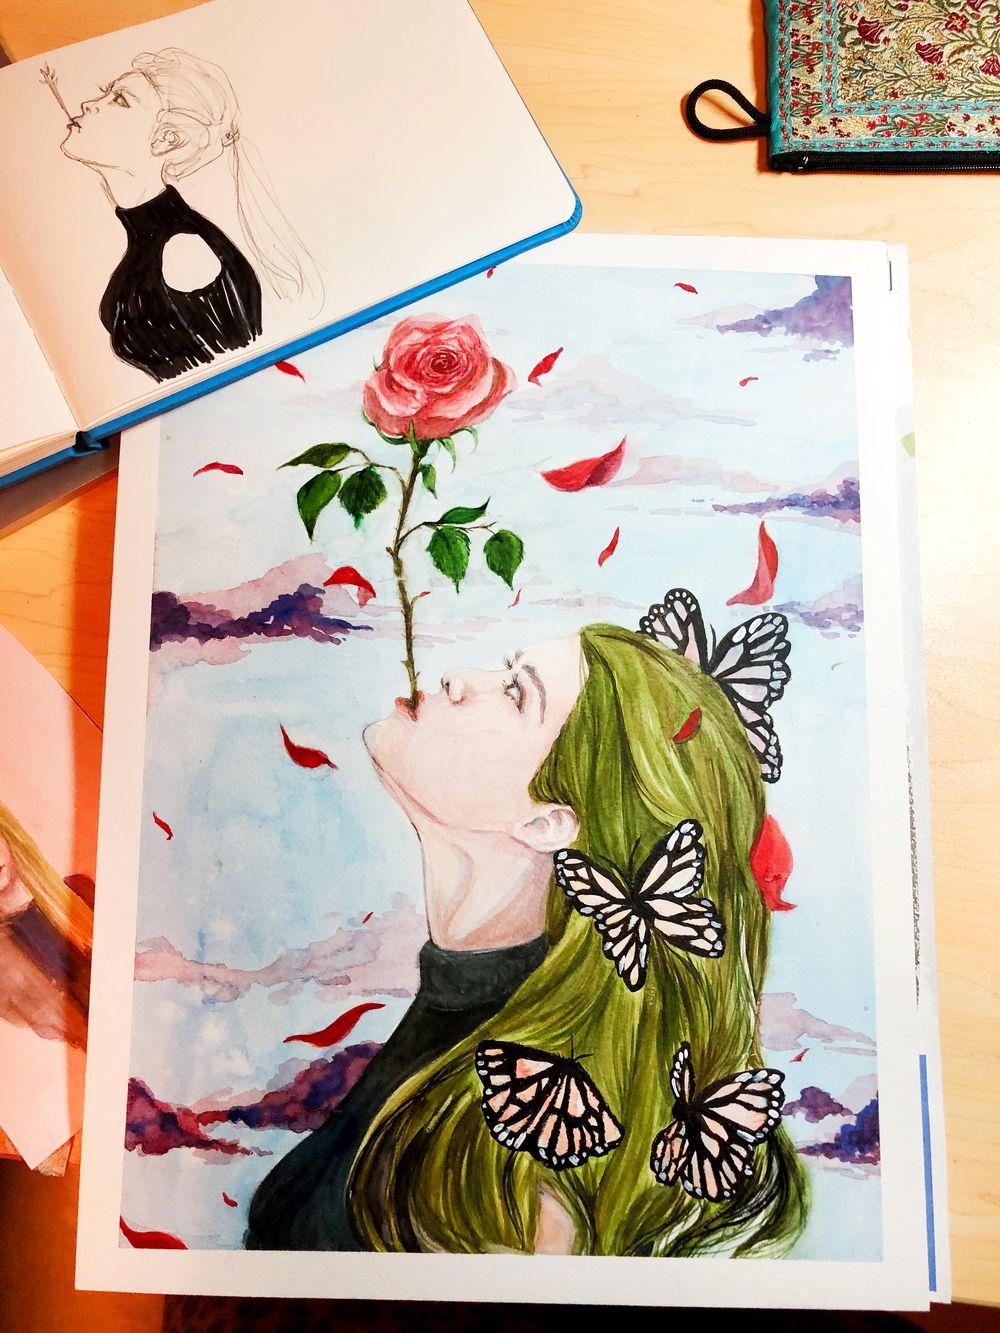 Portrait illustration - image 1 - student project